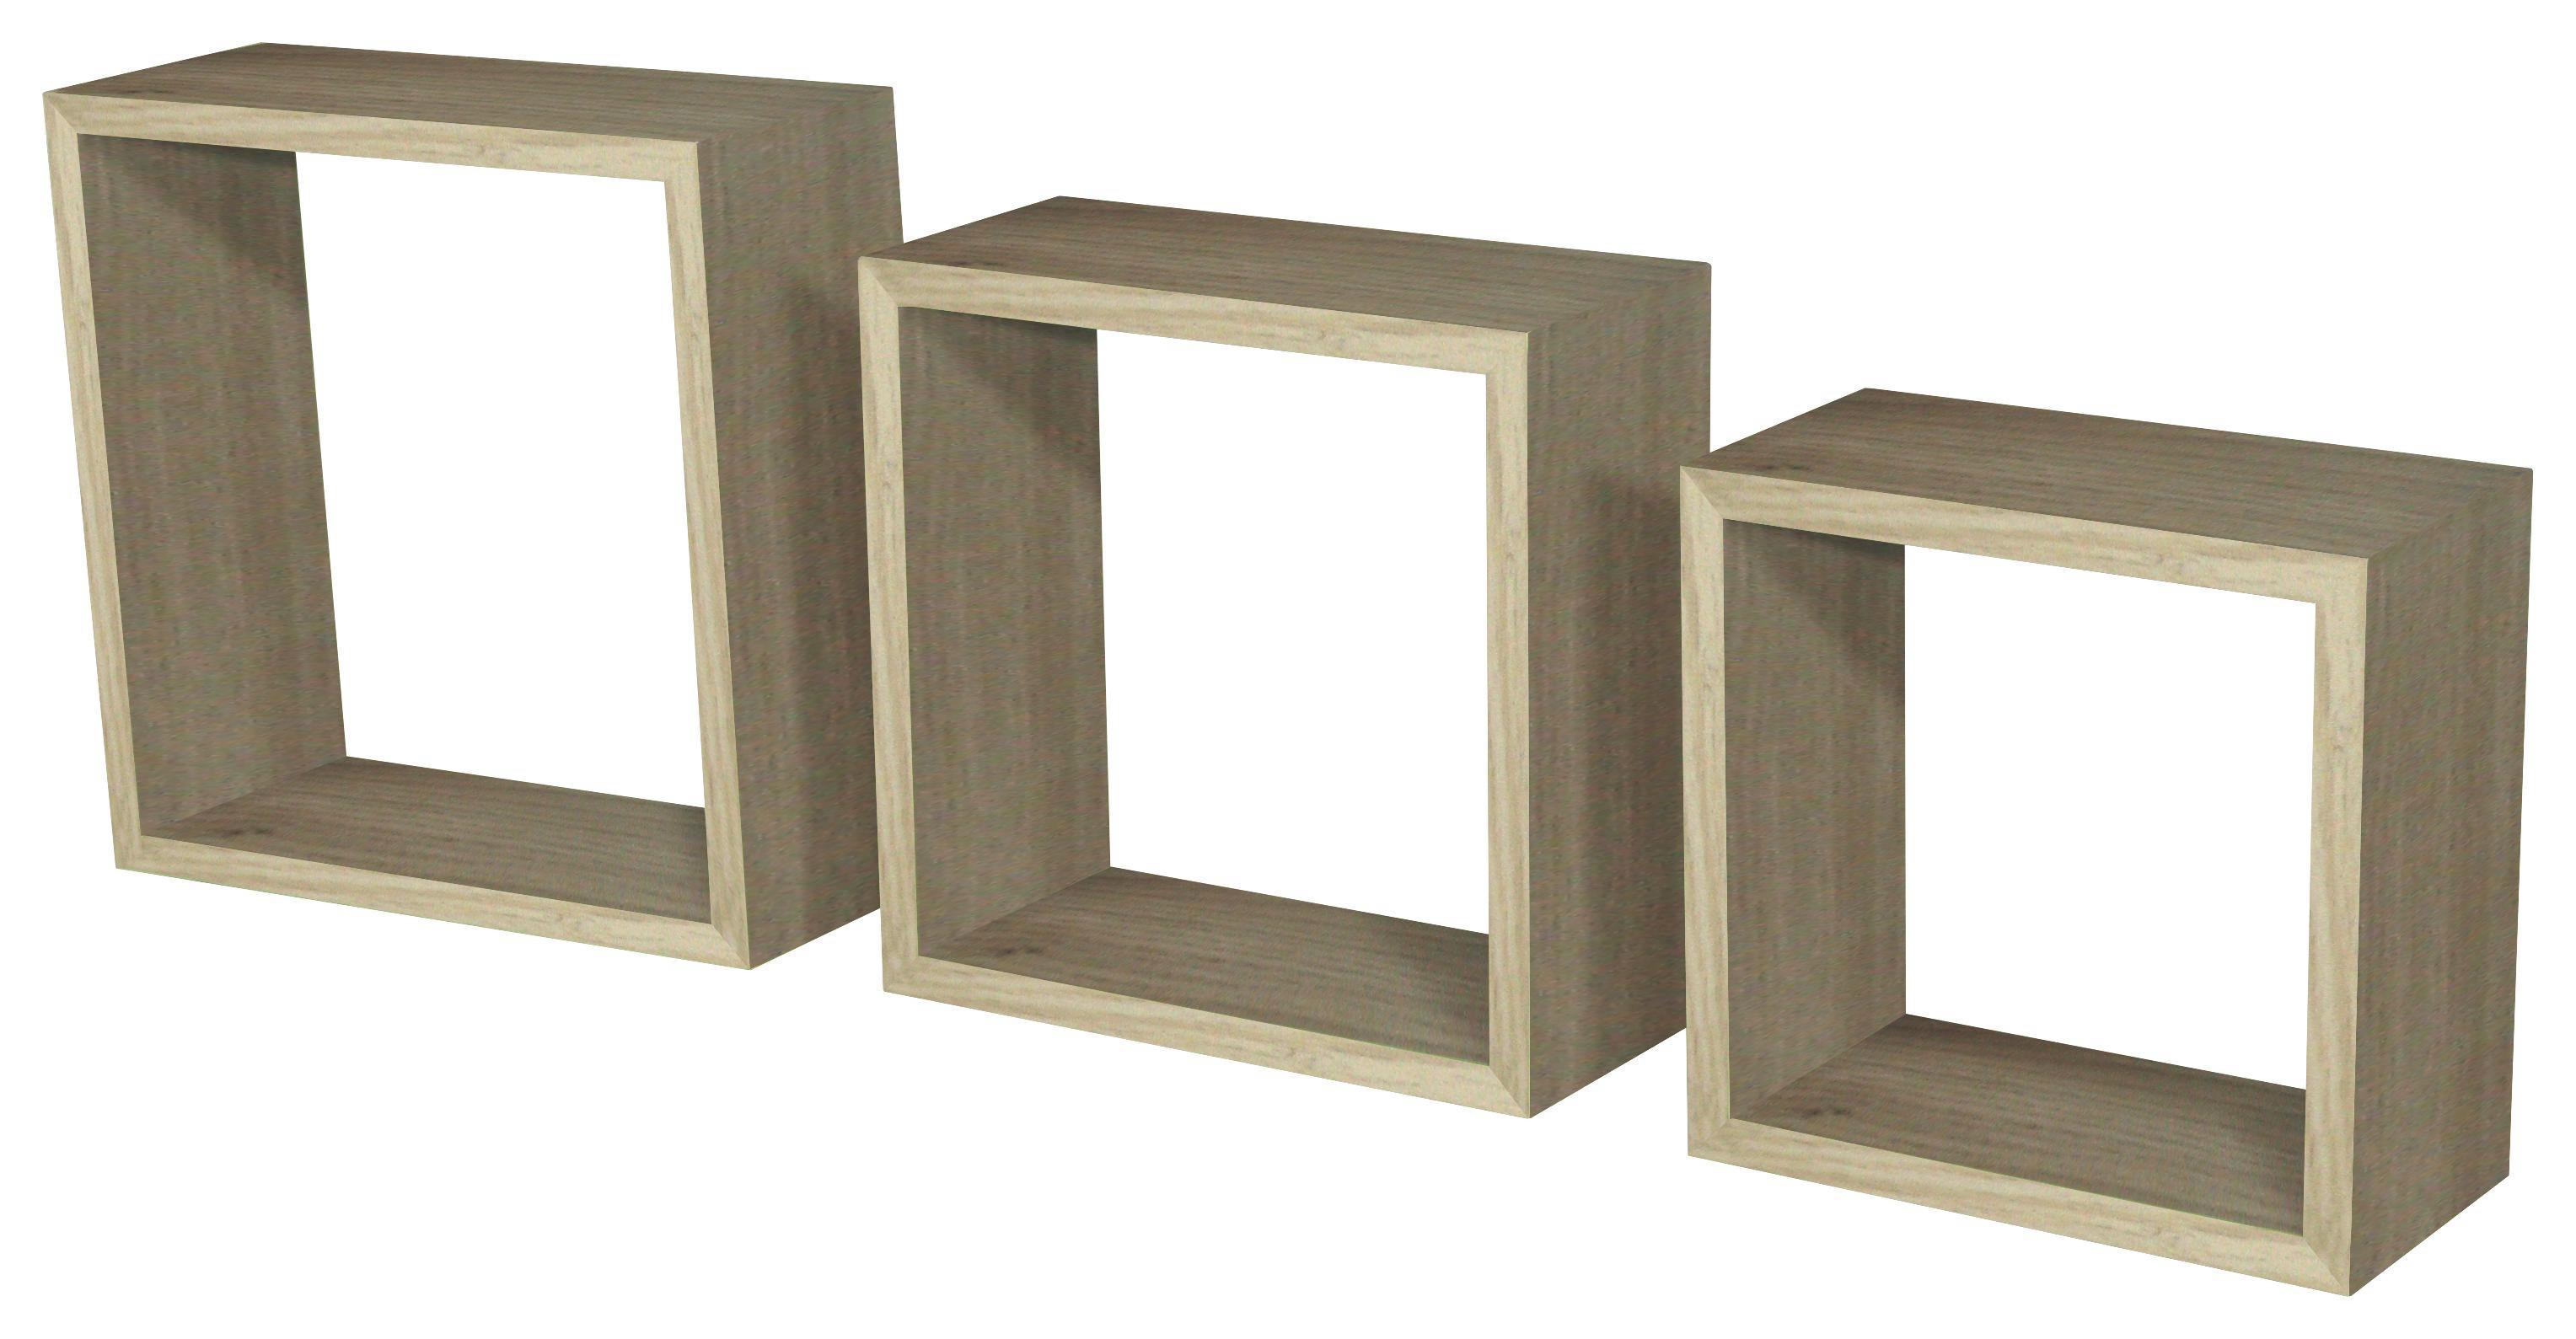 Falipolc Simple - tölgy színű, modern, műanyag/faanyagok (30/30/12cm)